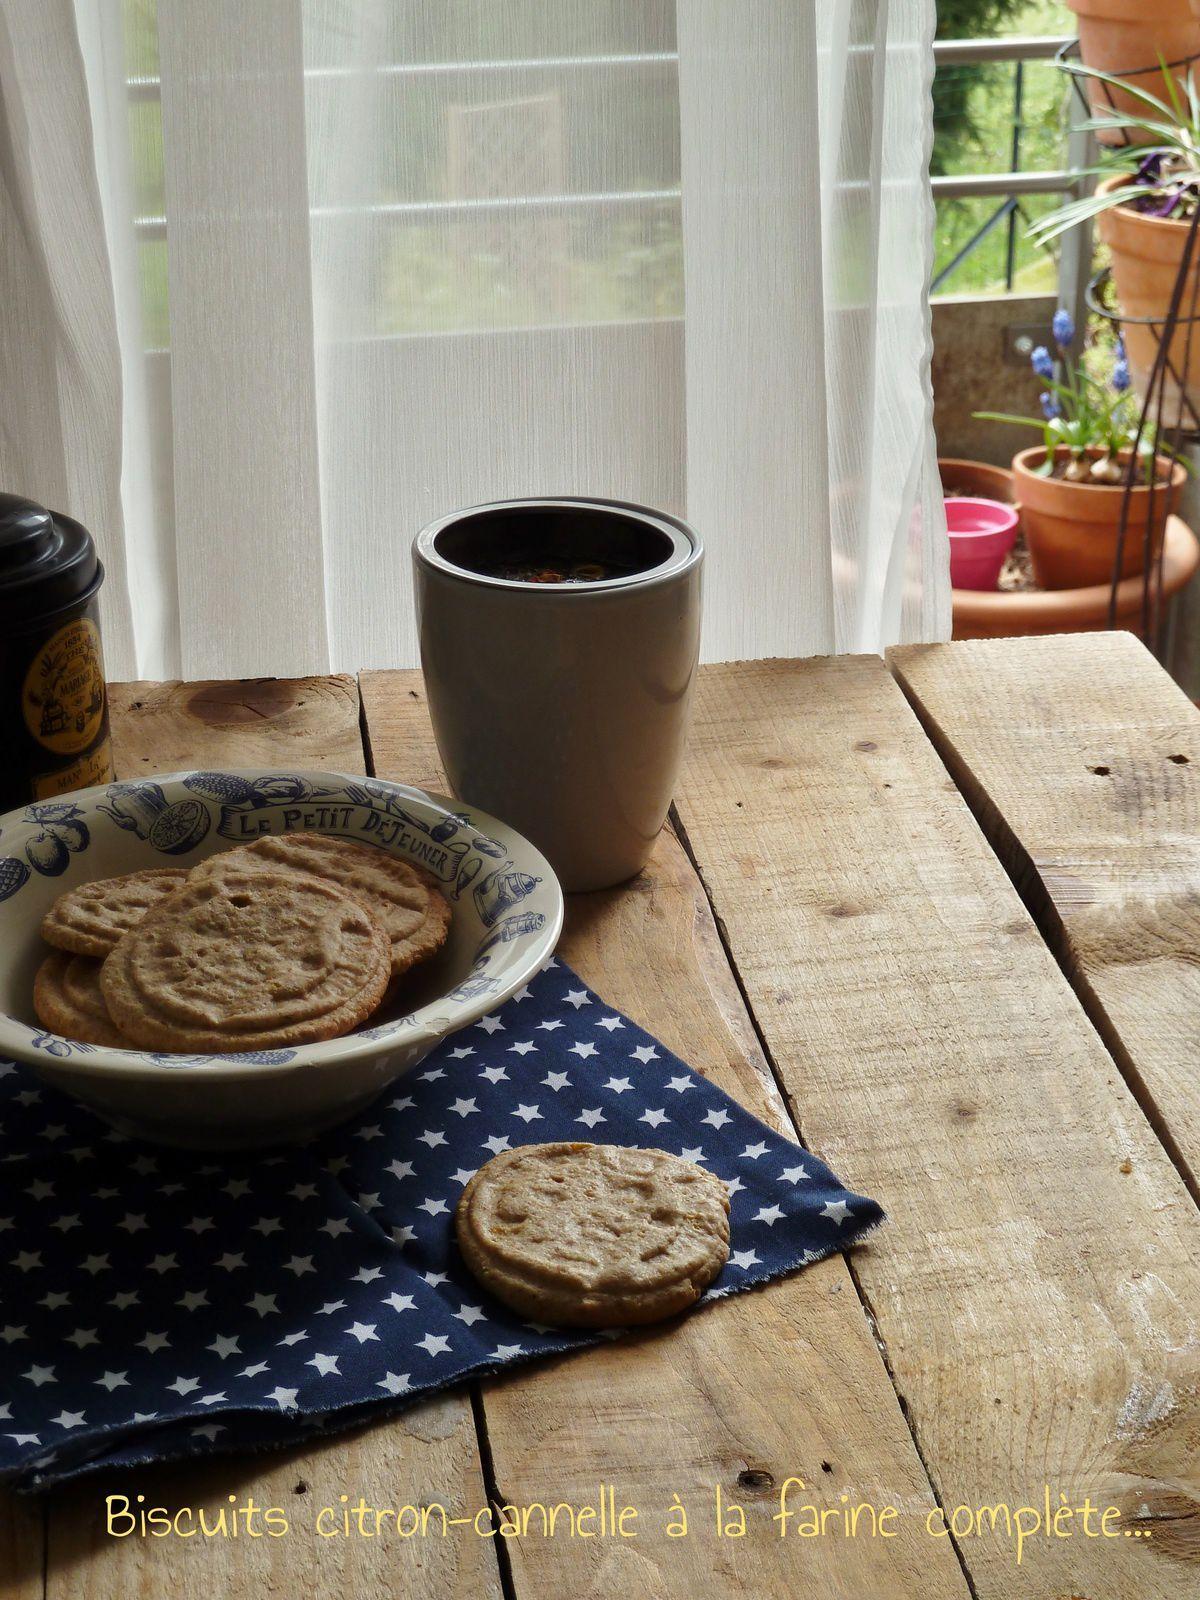 Biscuits citron-cannelle à la farine complete